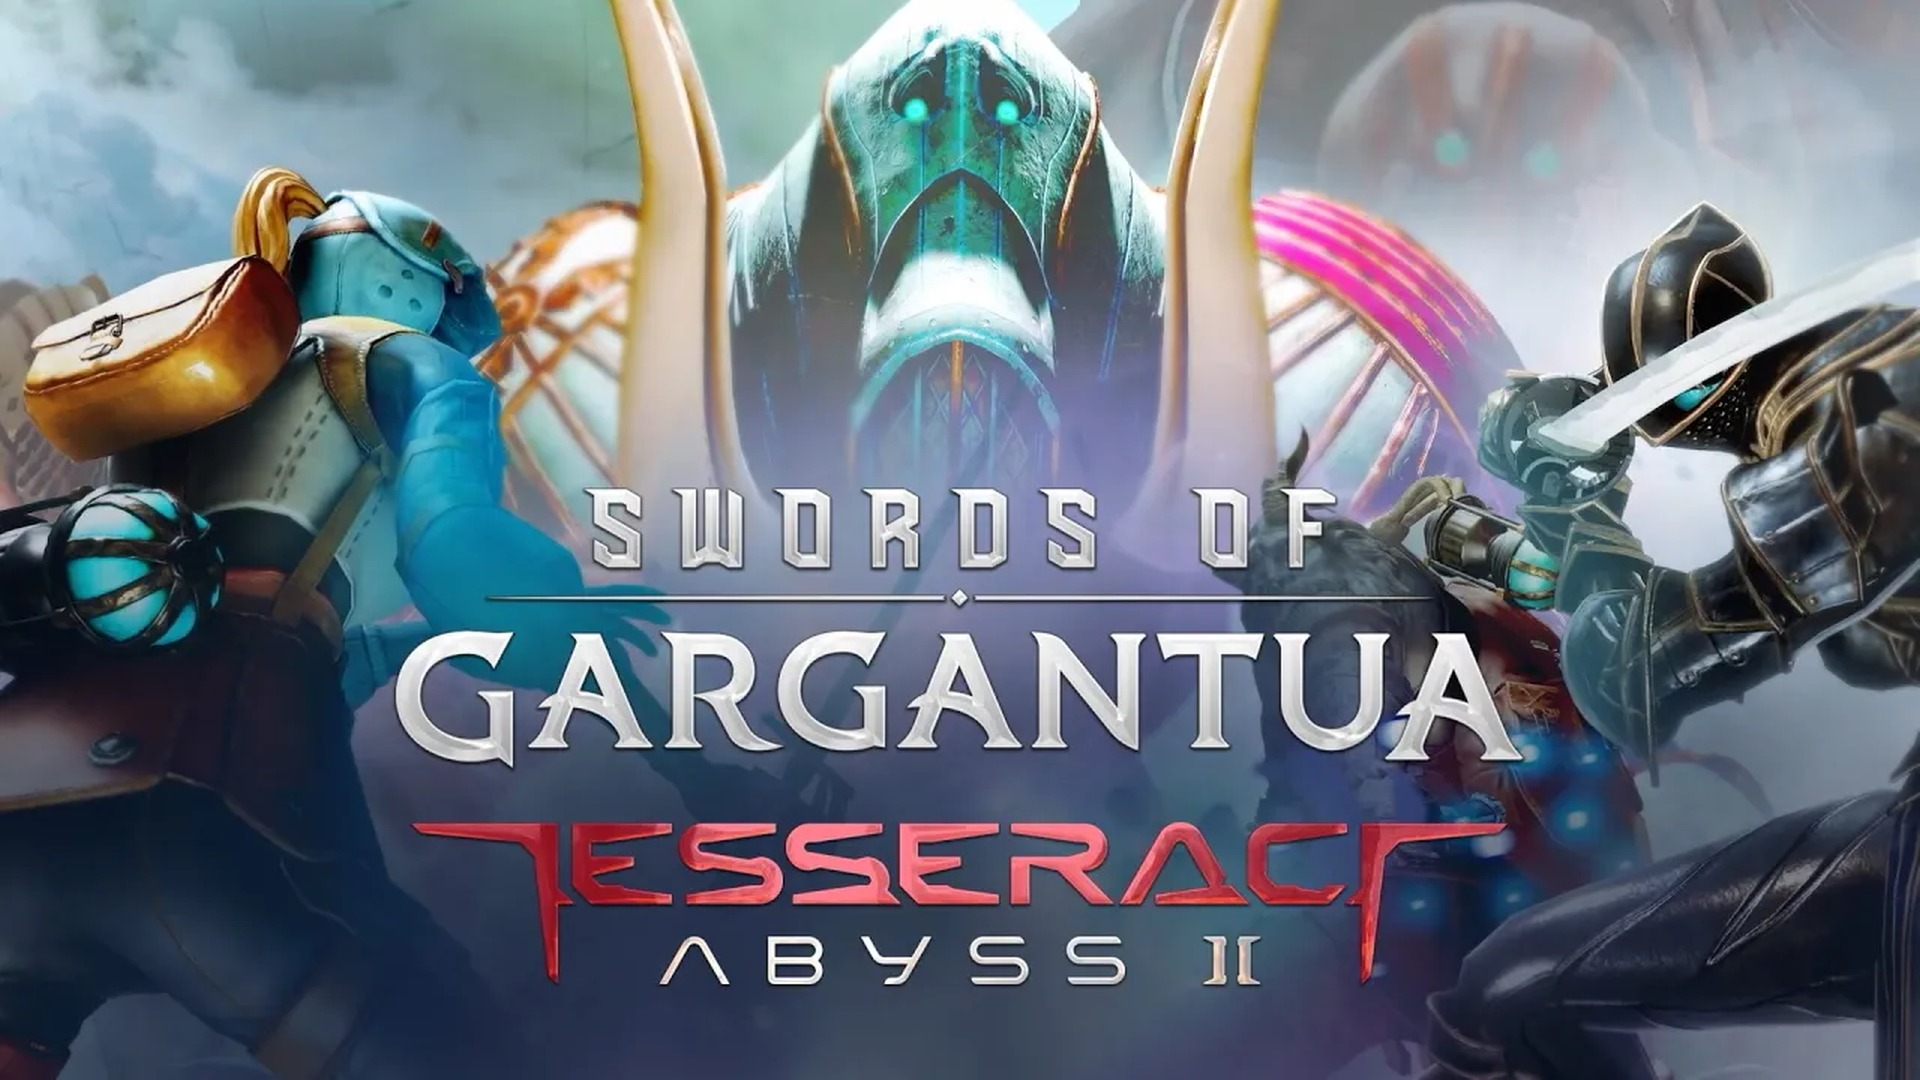 Swords of Gargantua: Tesseract Abyss 2 | Thirdverse